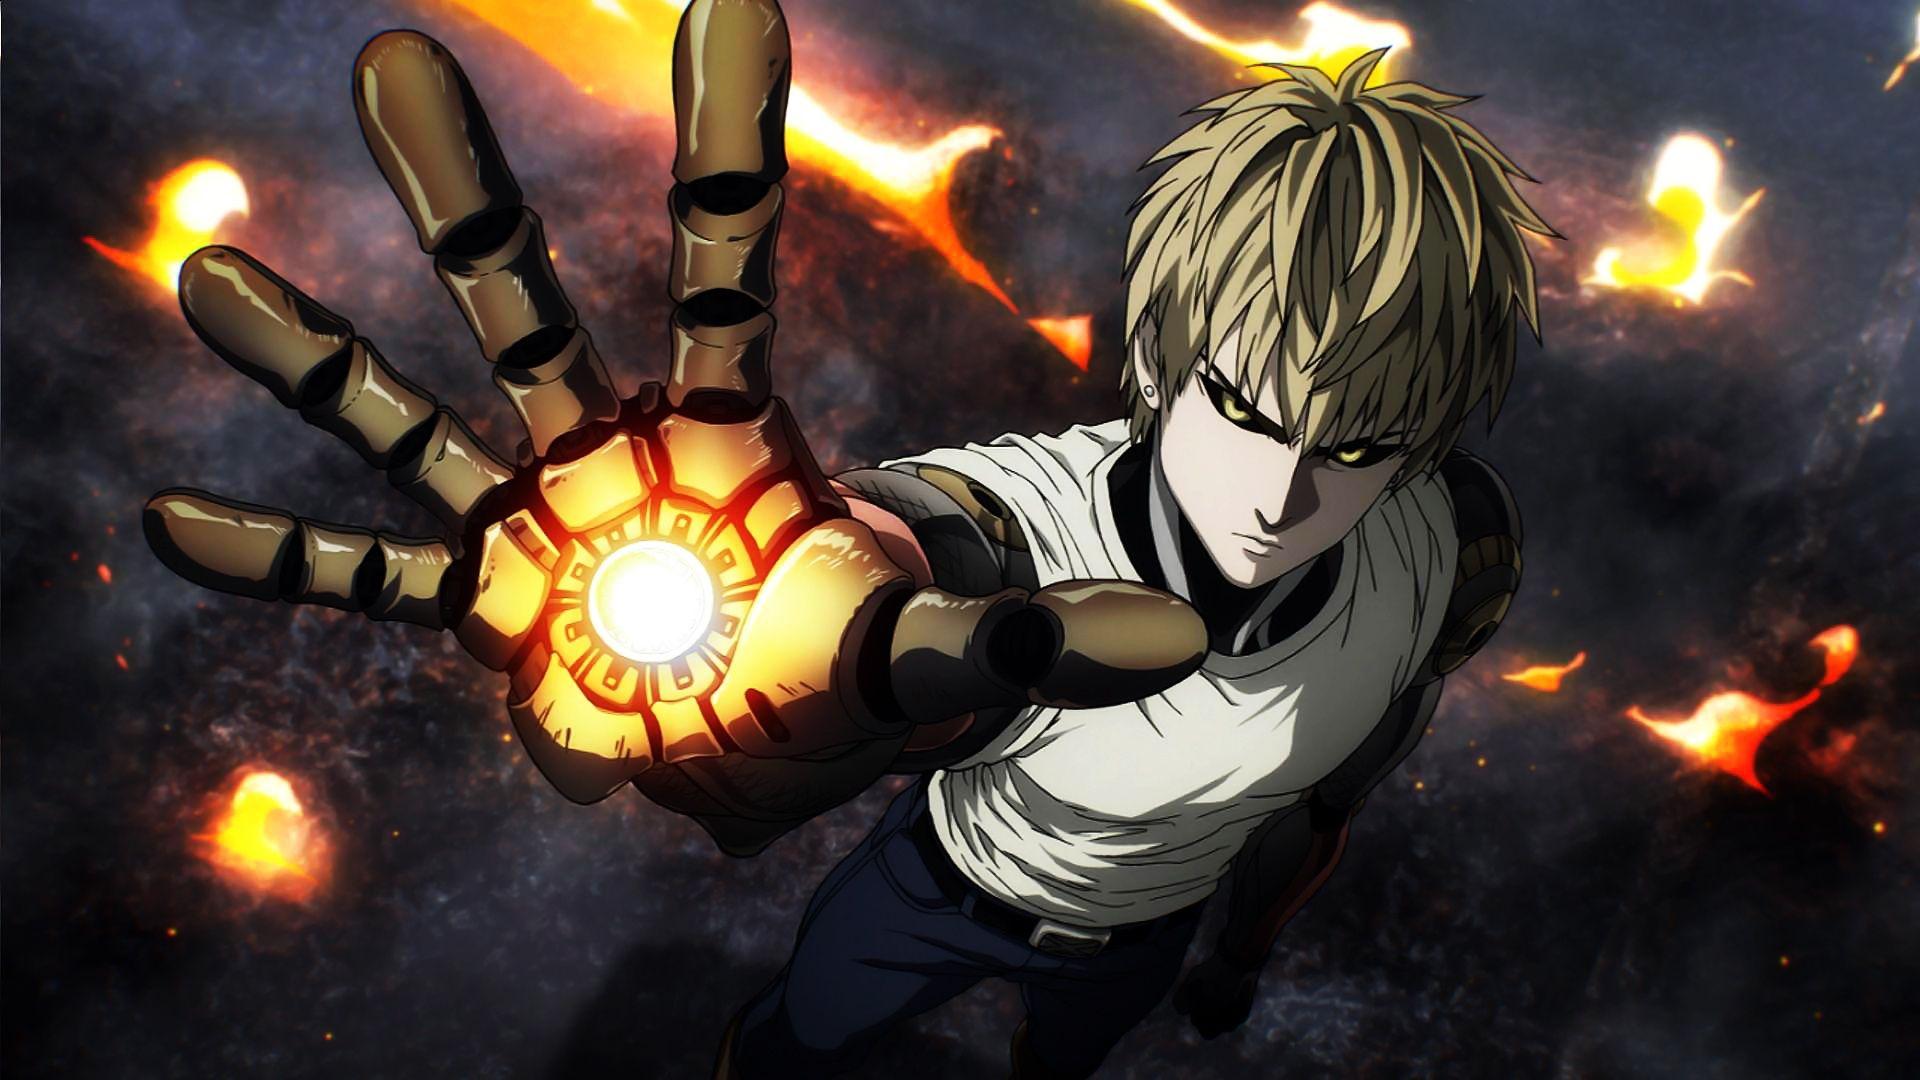 Anime OnePunch Man Genos Wallpaper Anime one punch man